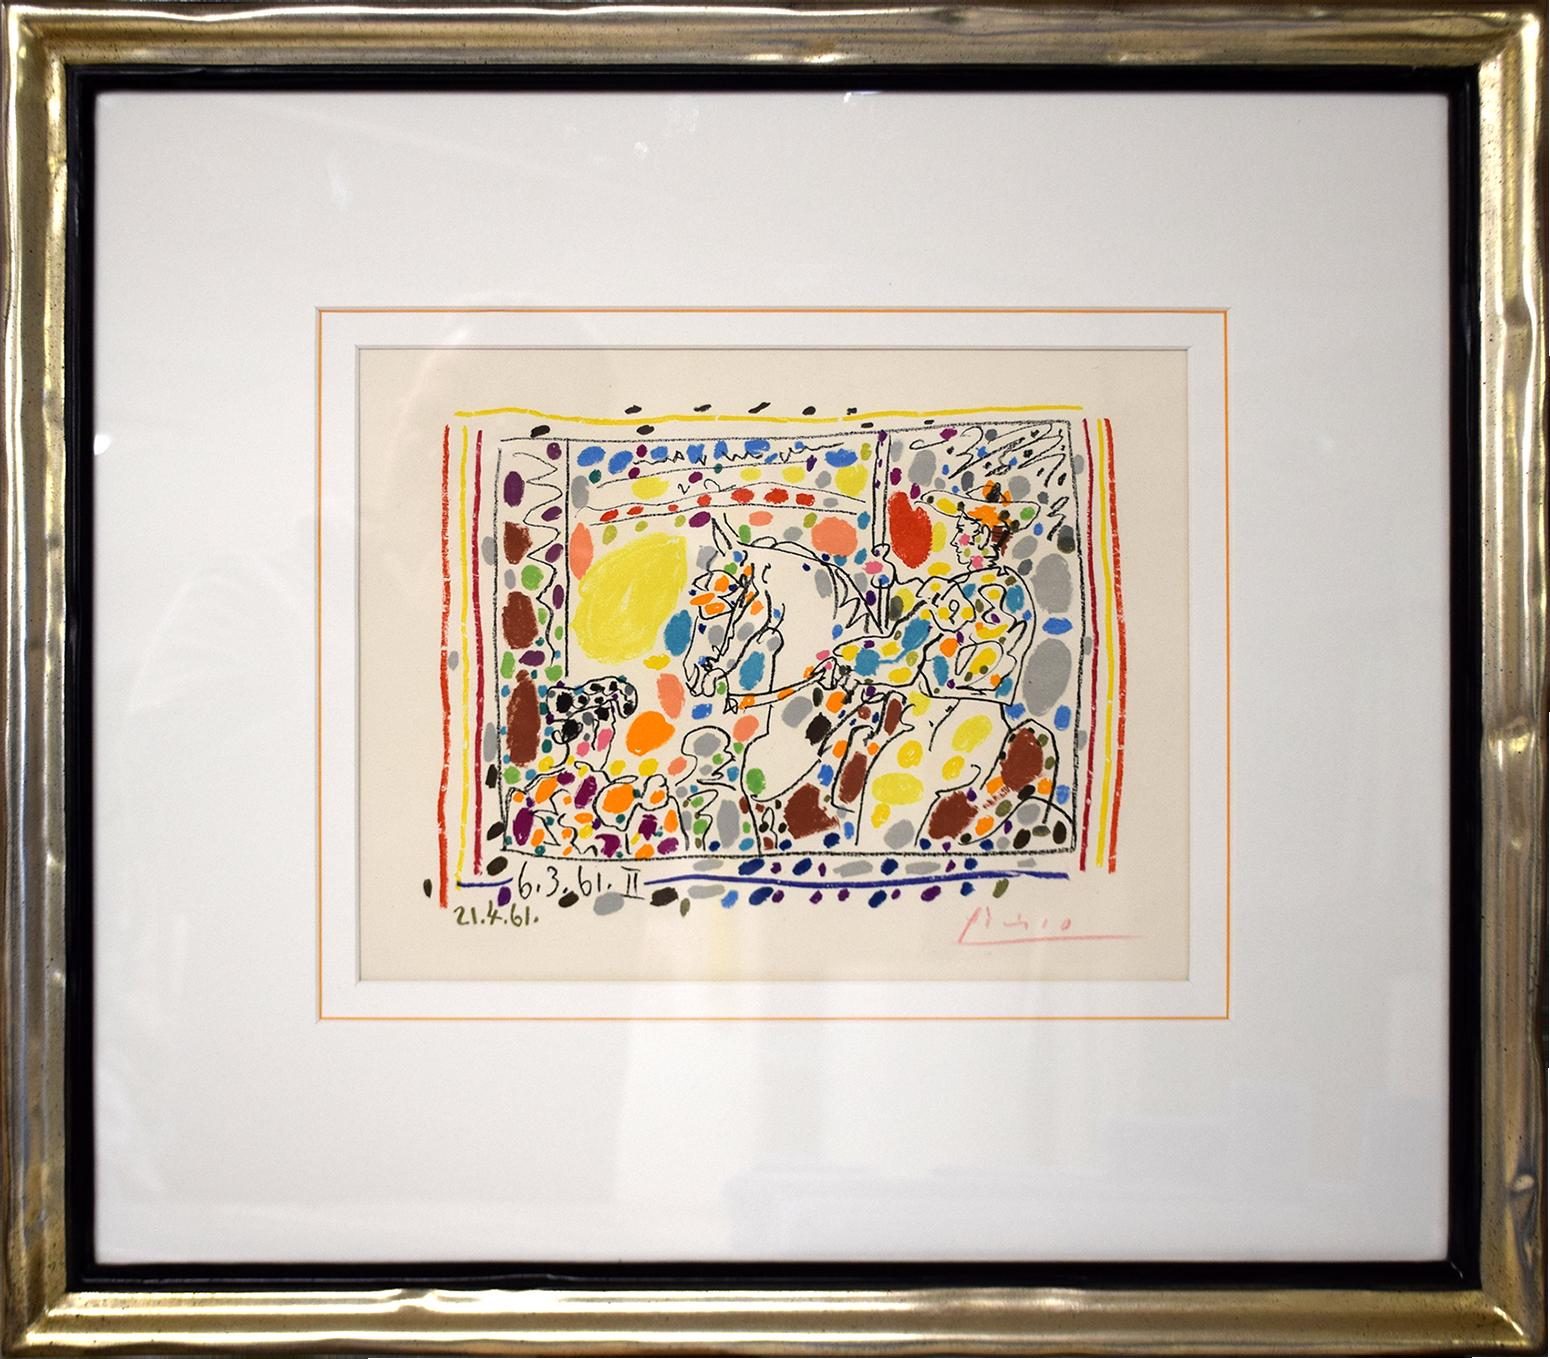 Pablo Picasso - The Picador II , 0613-008-151